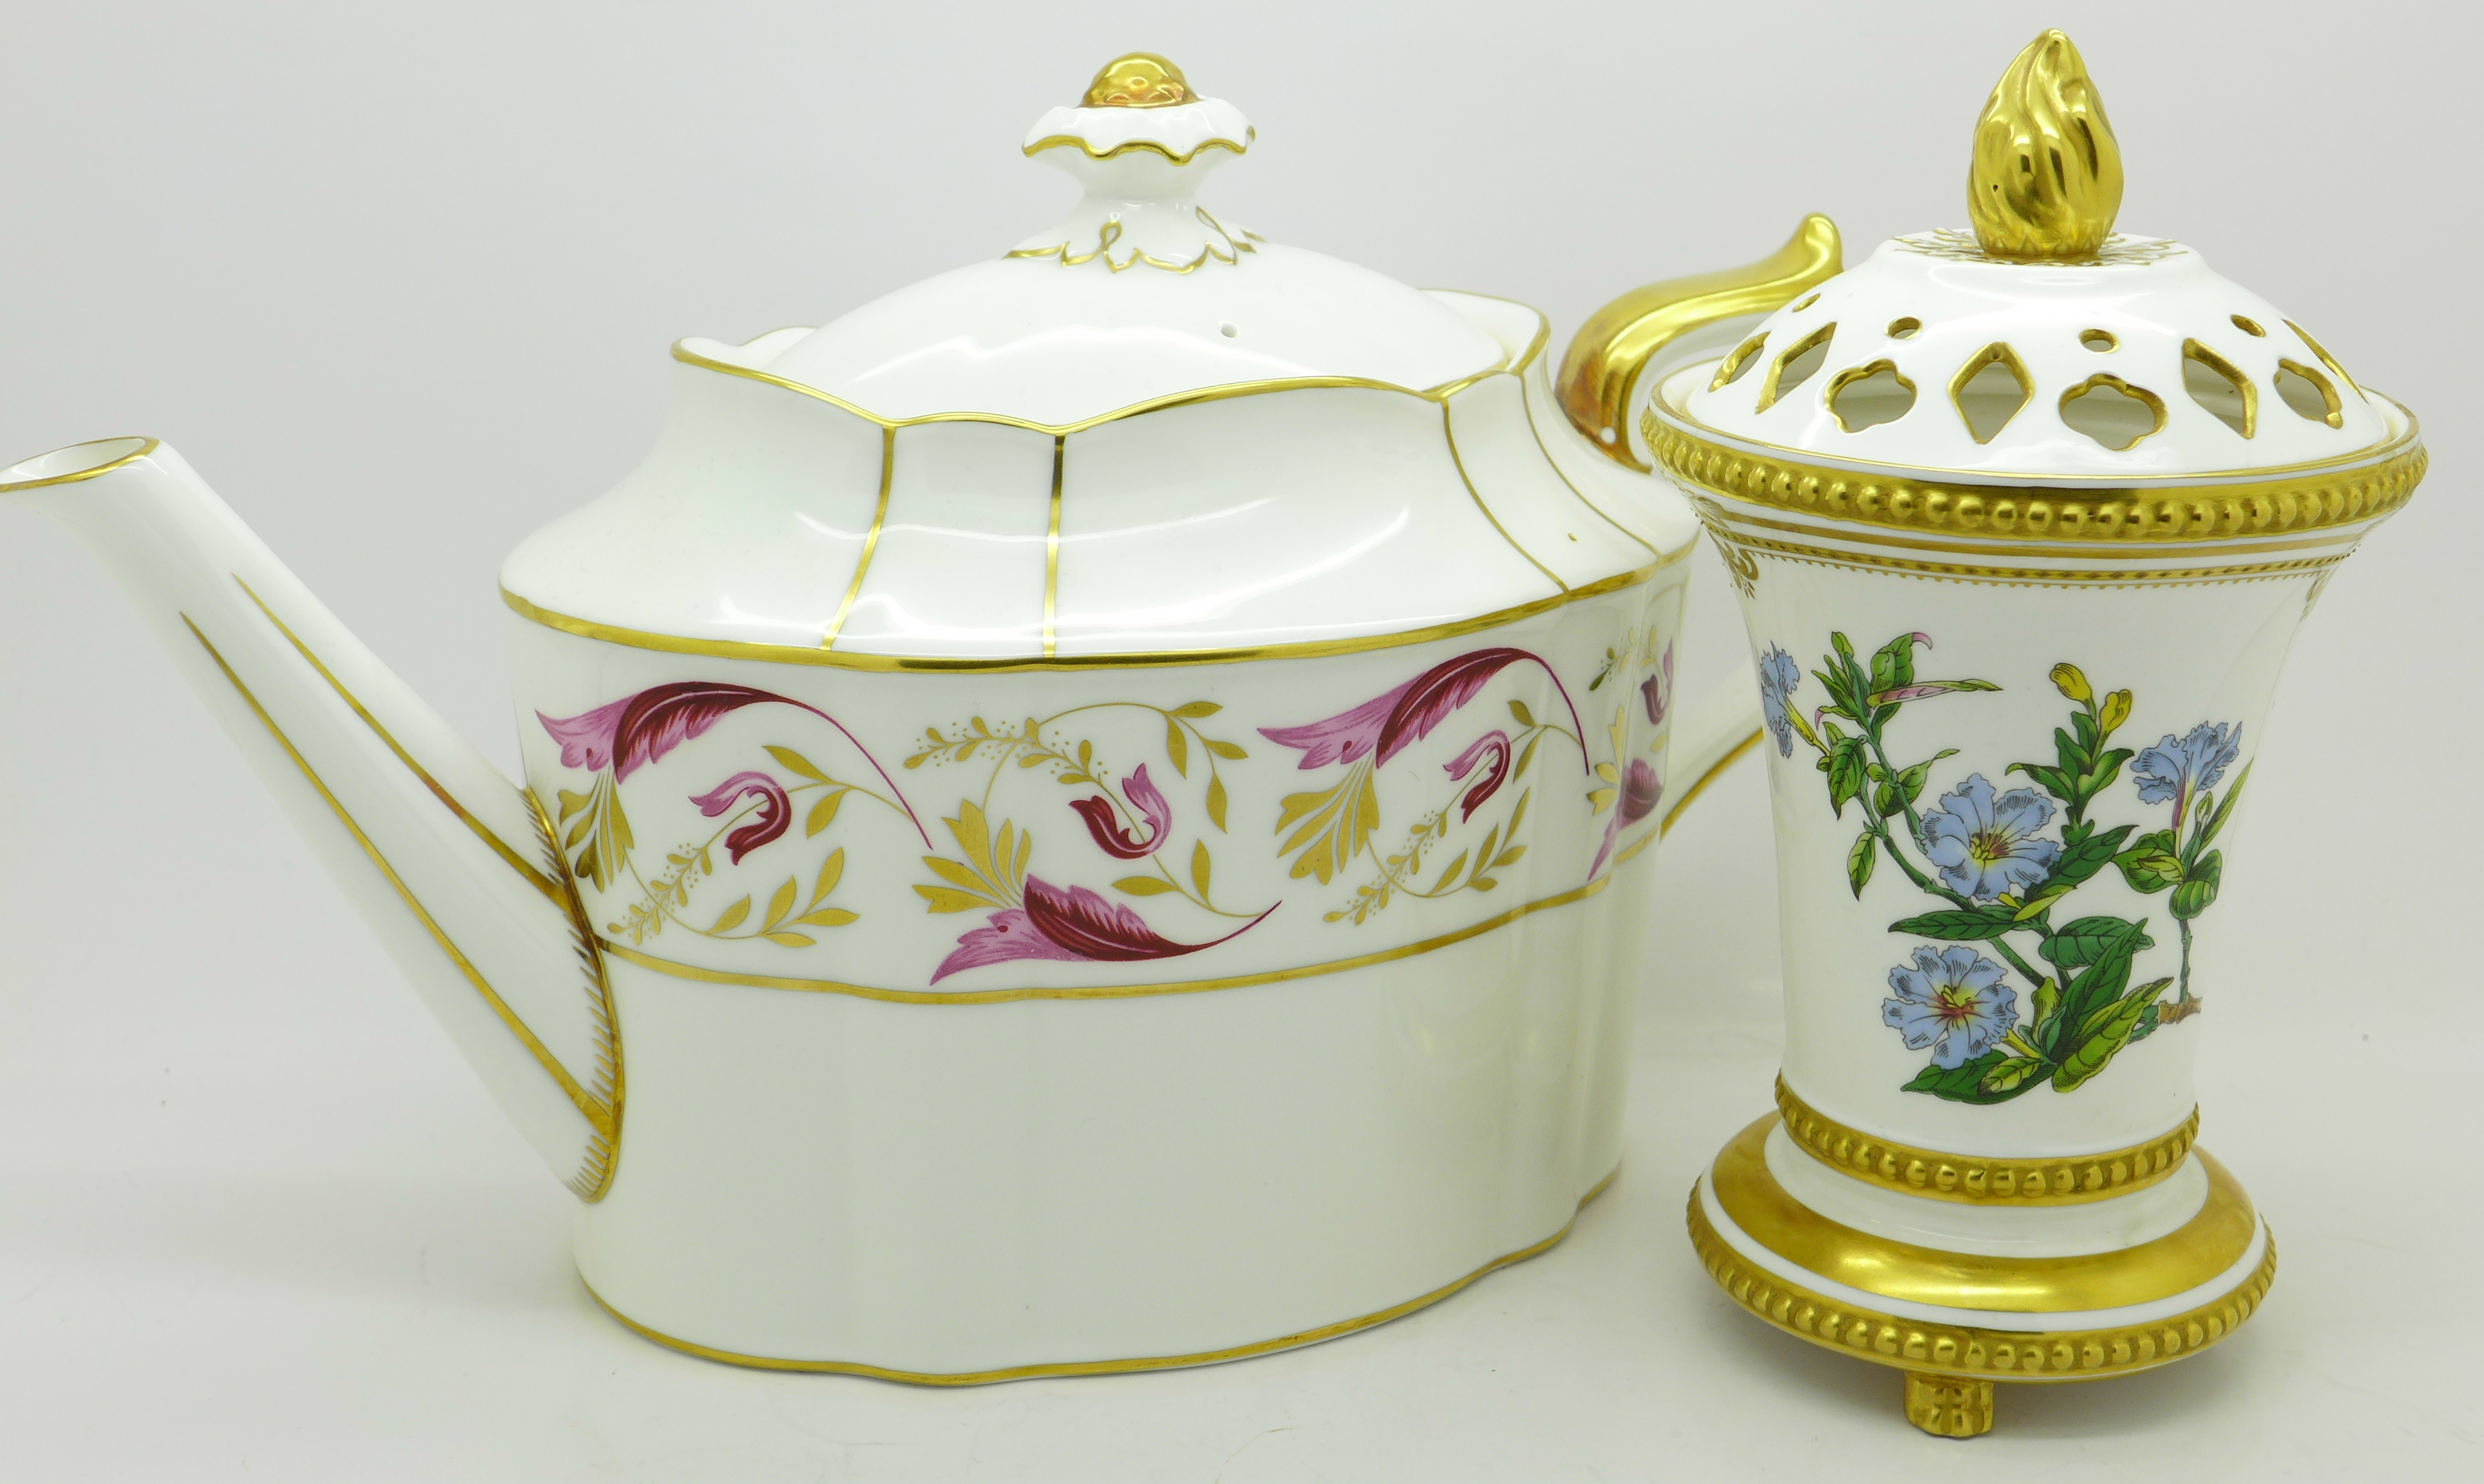 Lot 610 - A Royal Crown Derby 'Princess' tea pot, A1281, second and a Spode pot pourri, Dipteracanthus,